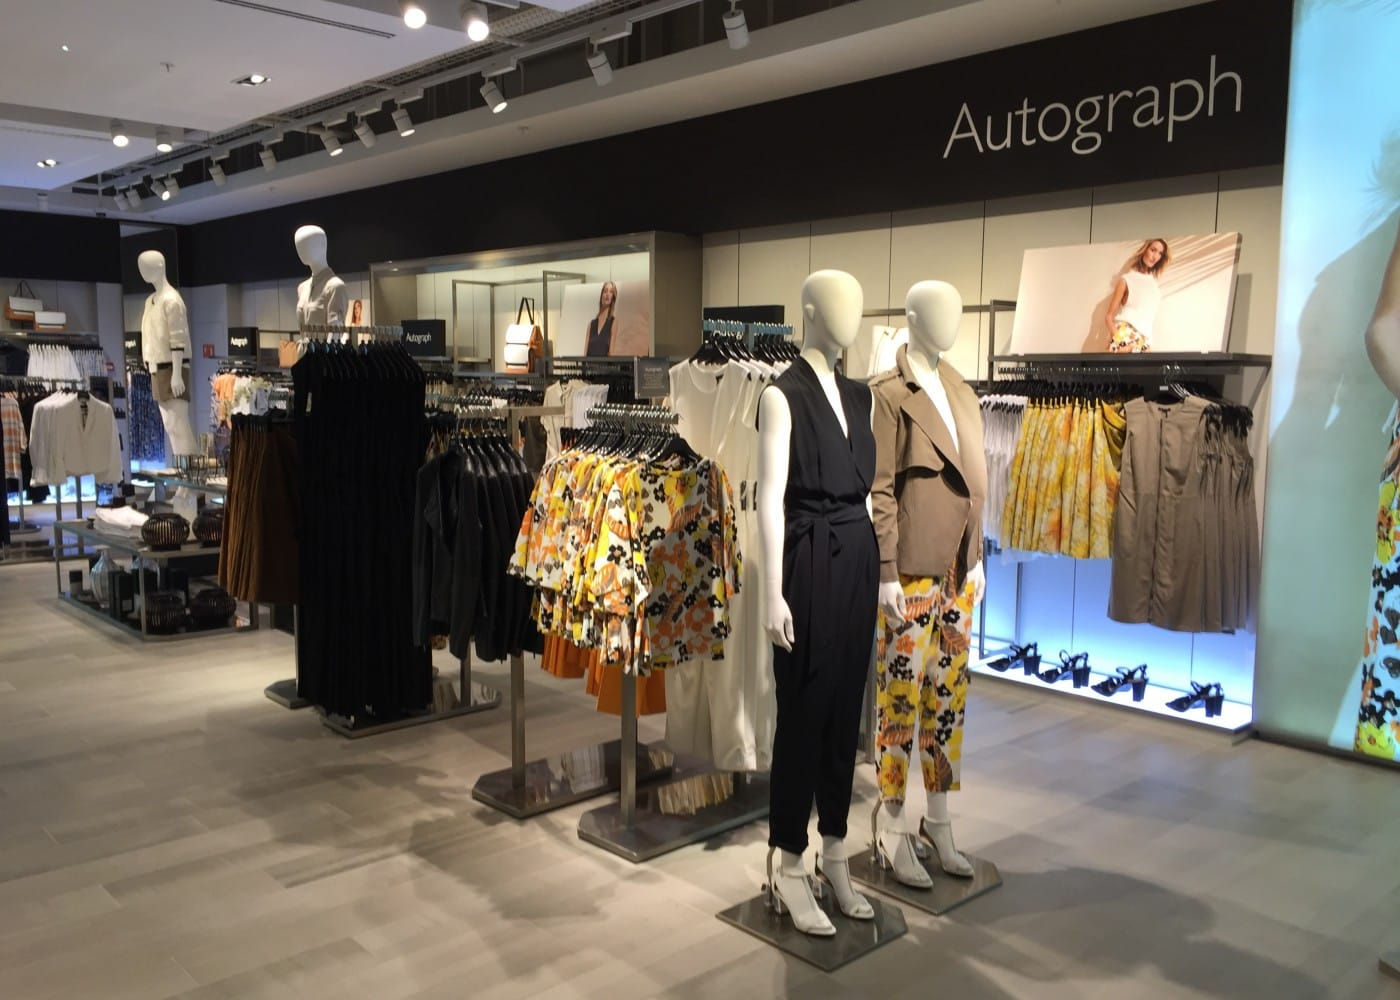 retail lighting design: M&S womenswear department